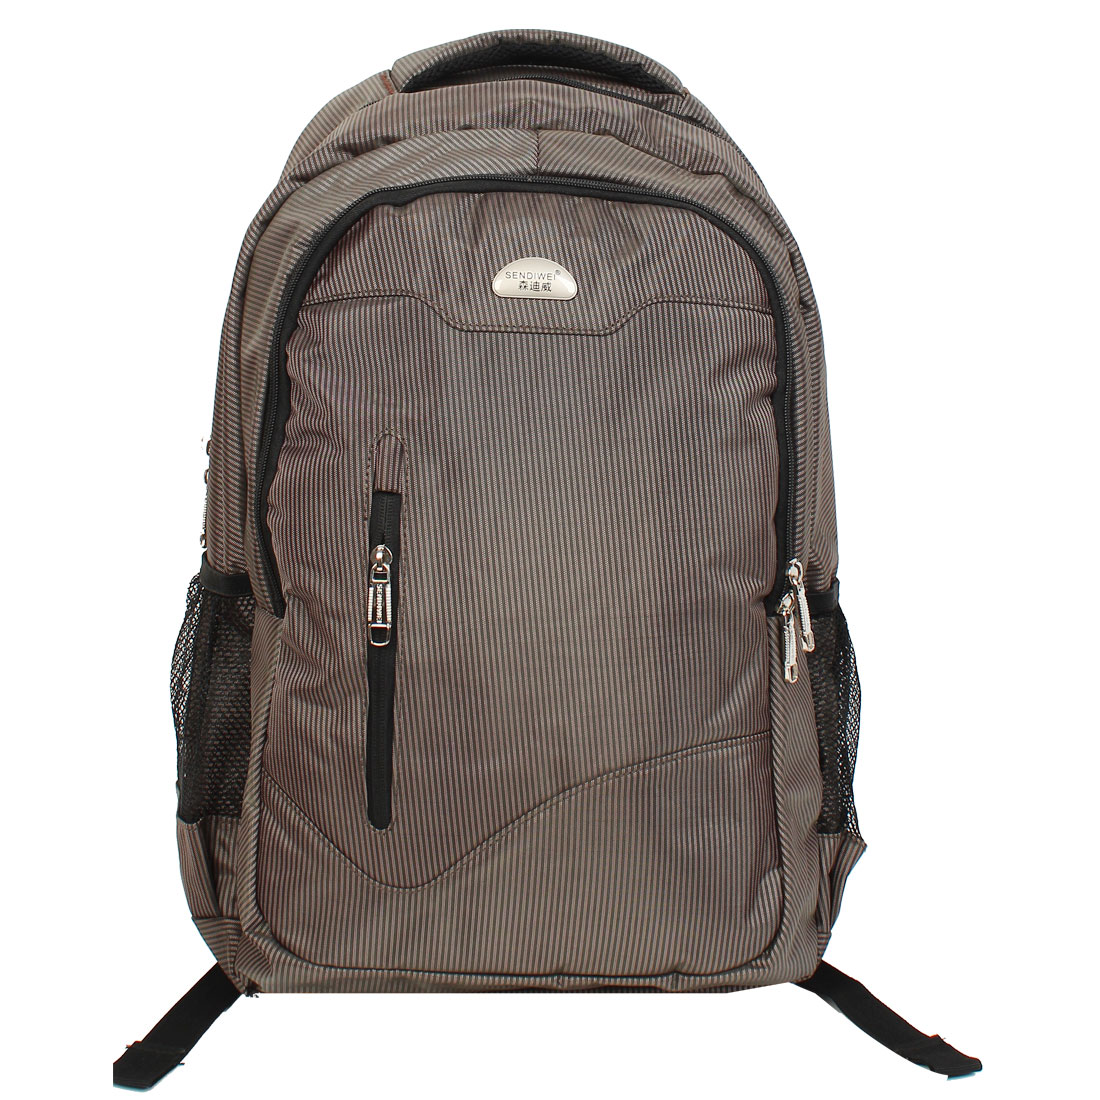 "Black Coffee Nylon 15"" 15.4"" Laptop School College Backpack Bag Case"